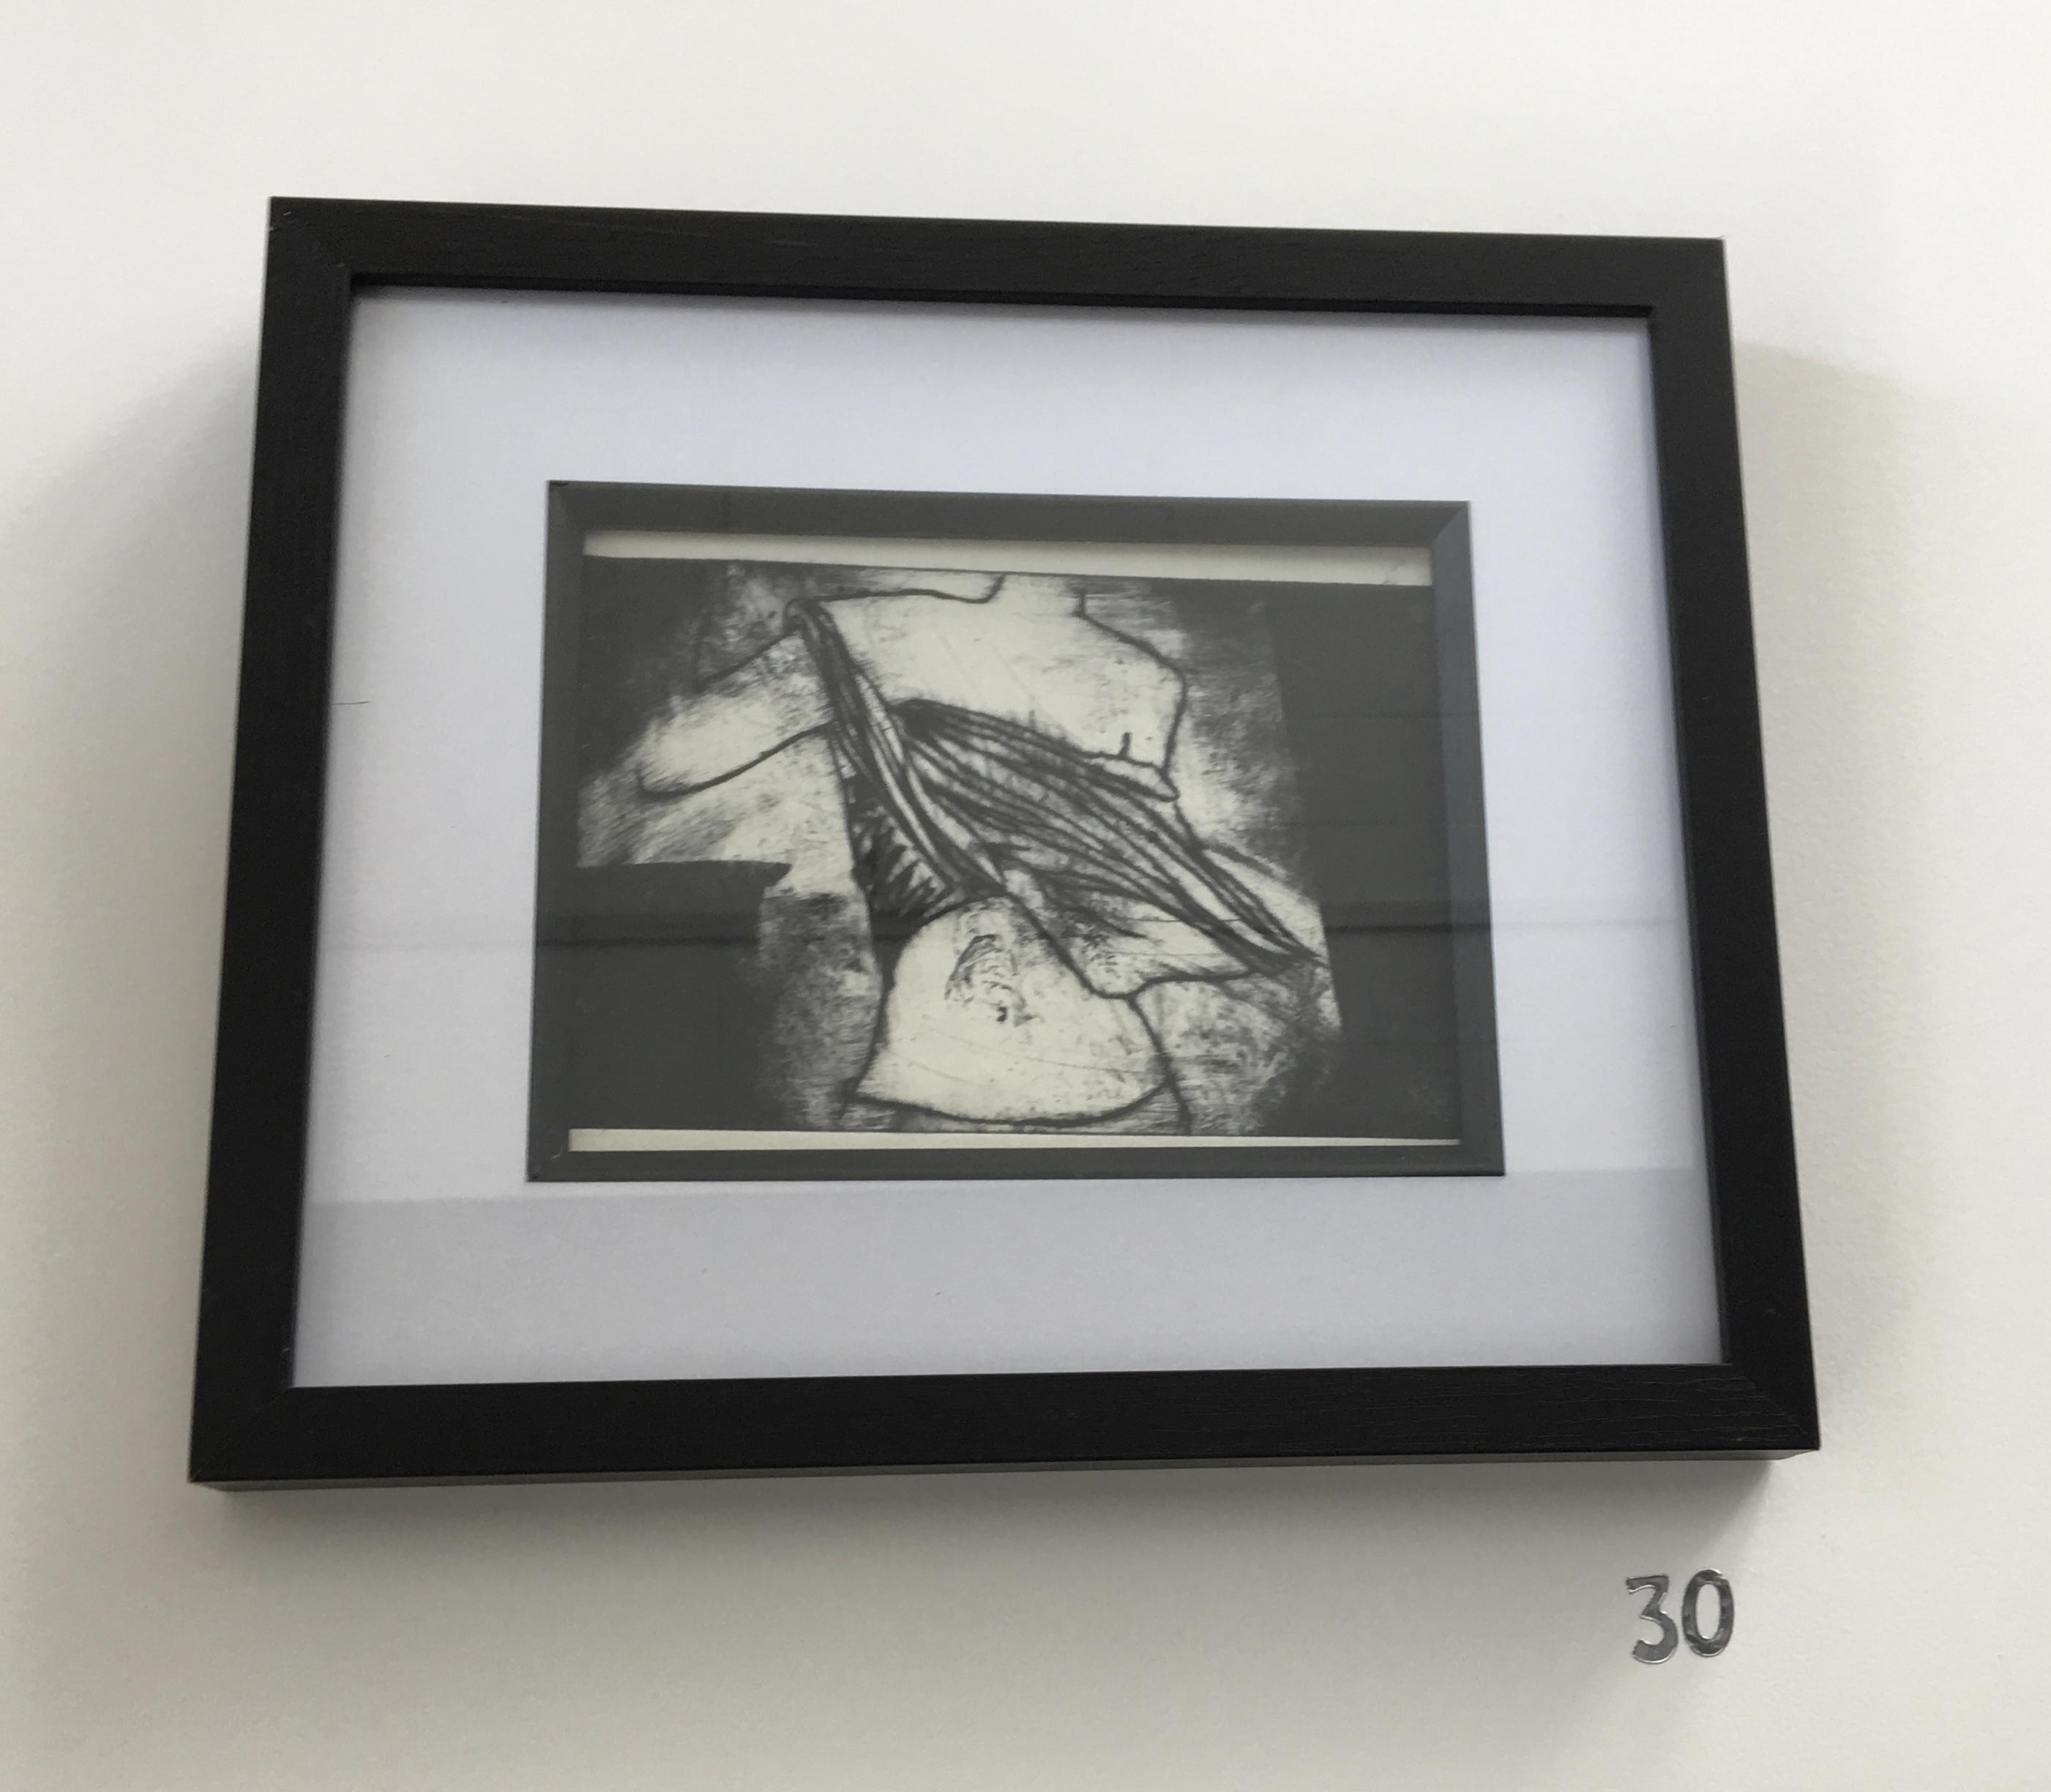 30. Untitled, Julie Dodds, 32.5 x 28 x 3, £ offers